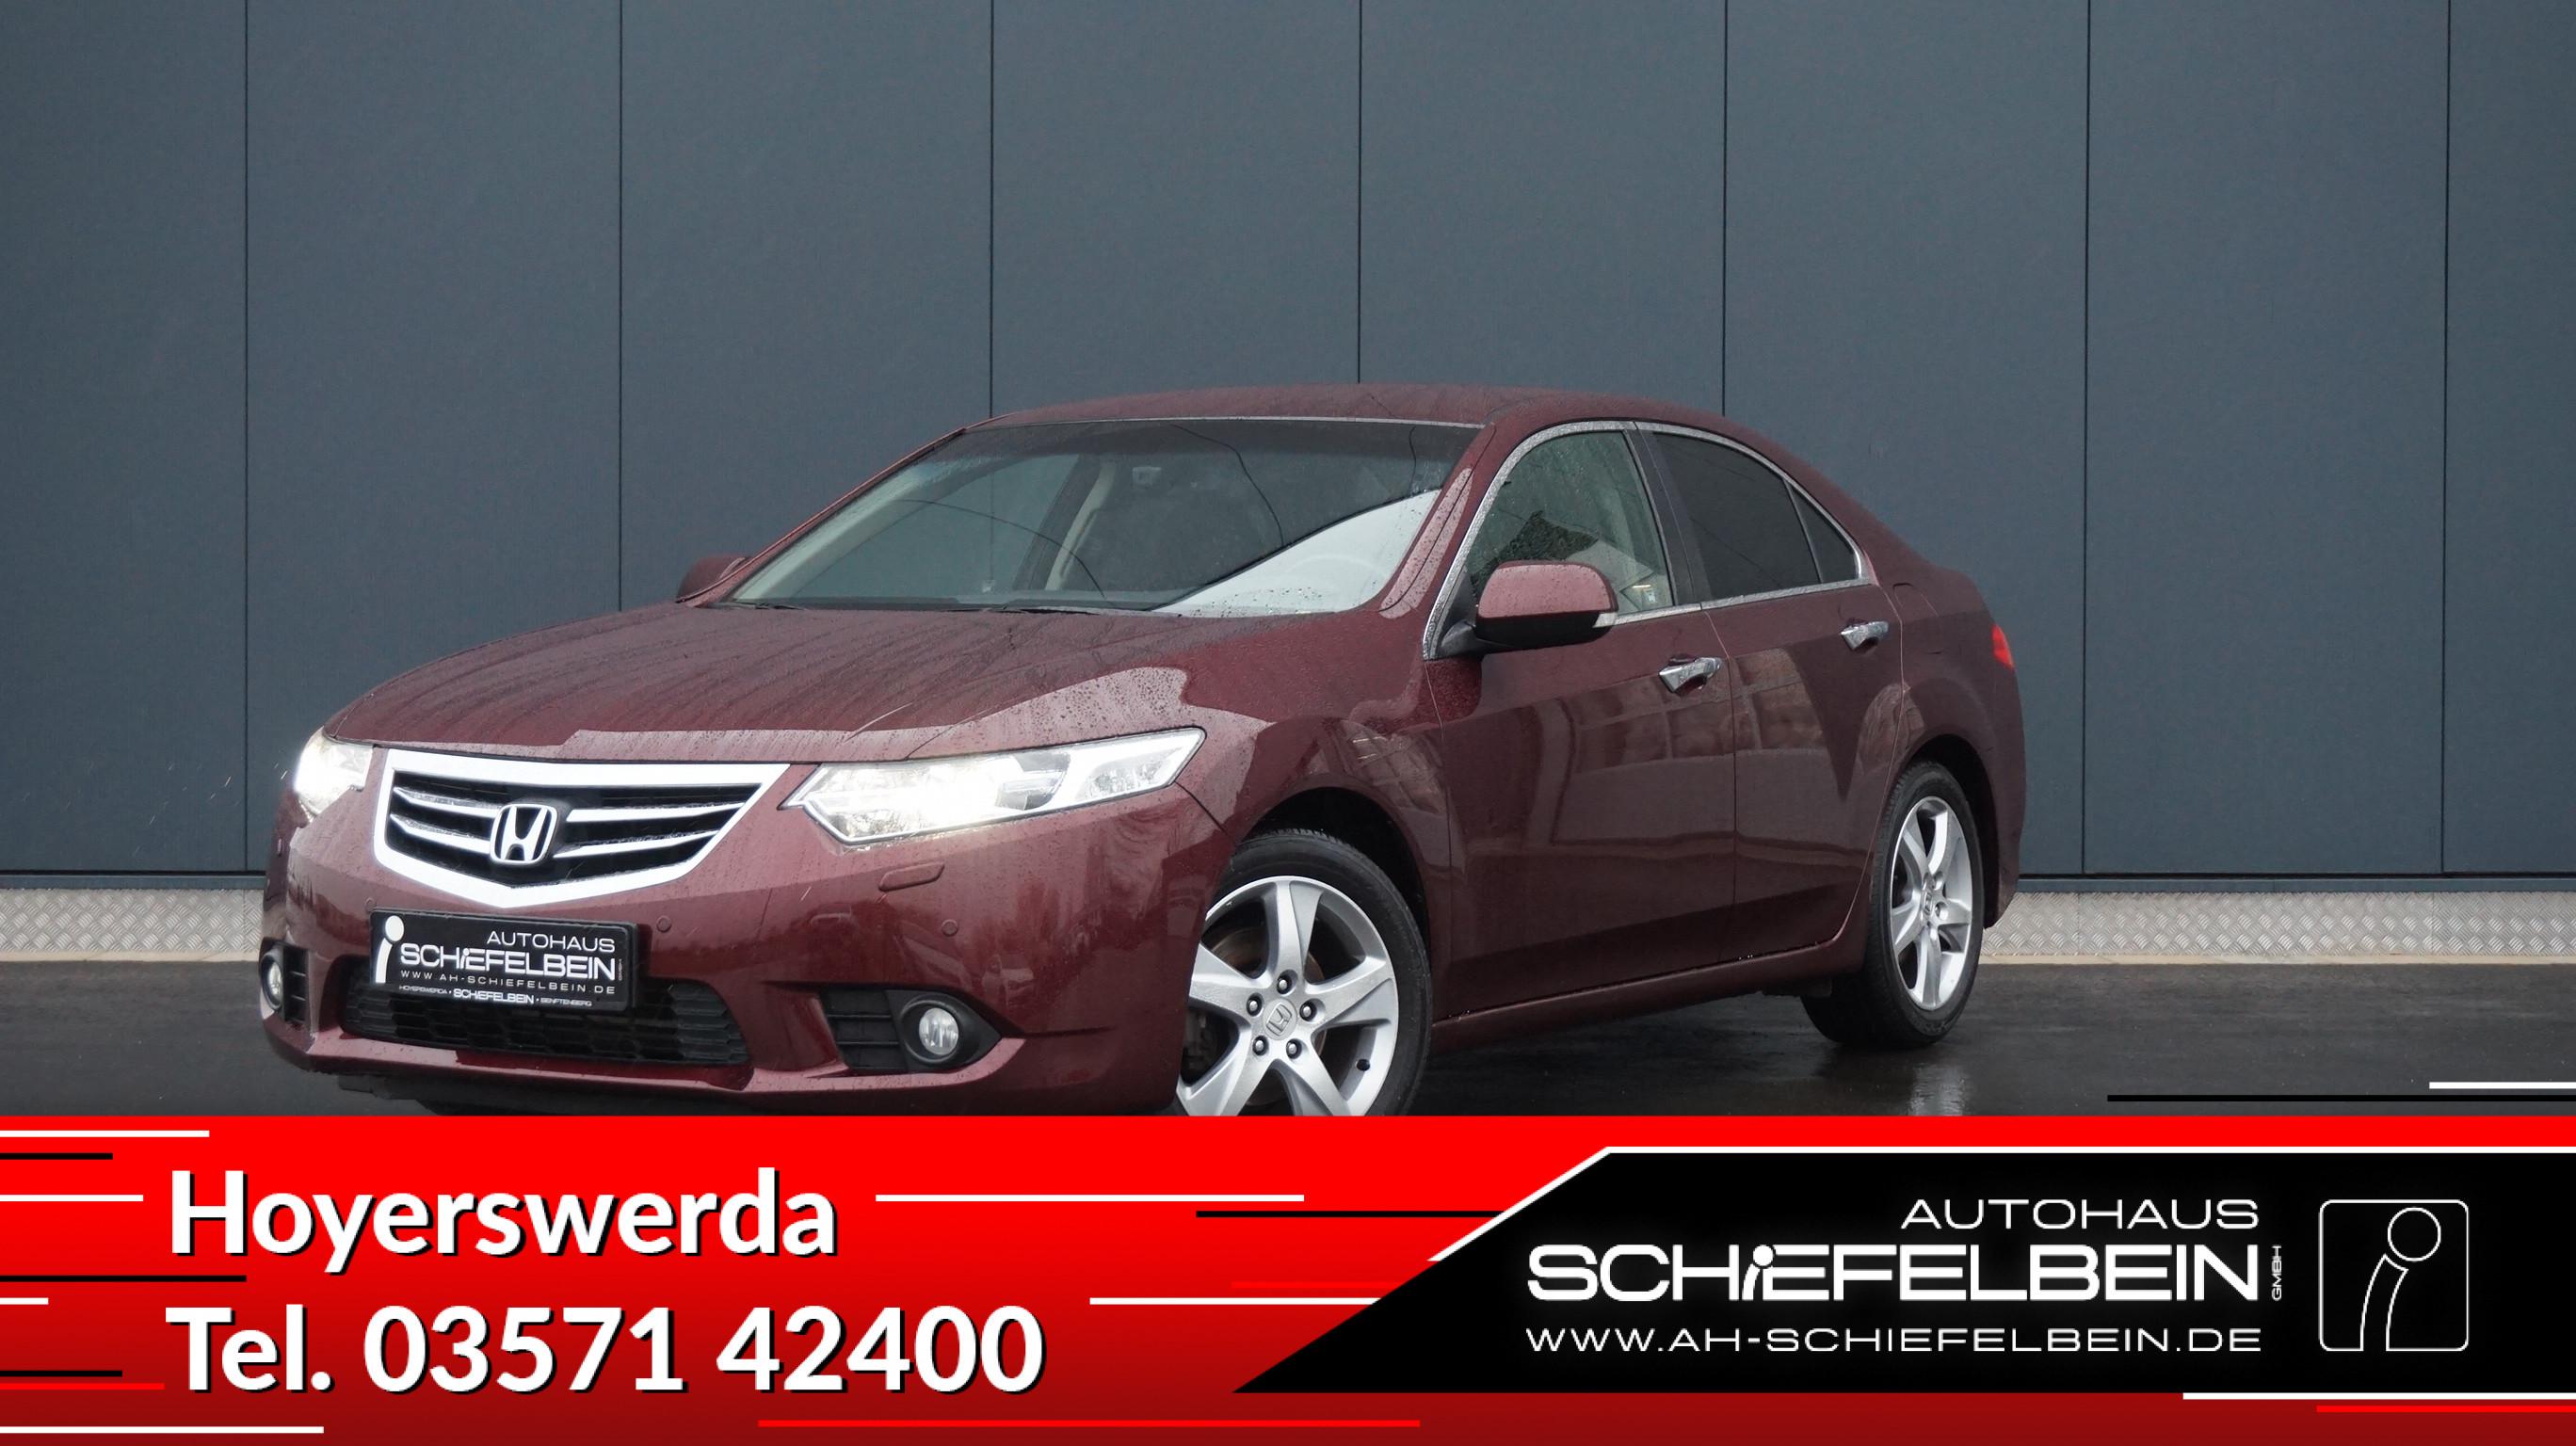 Honda Accord 2,0 Lifestyle-PDC*SHZ*Xenon*, Jahr 2012, petrol